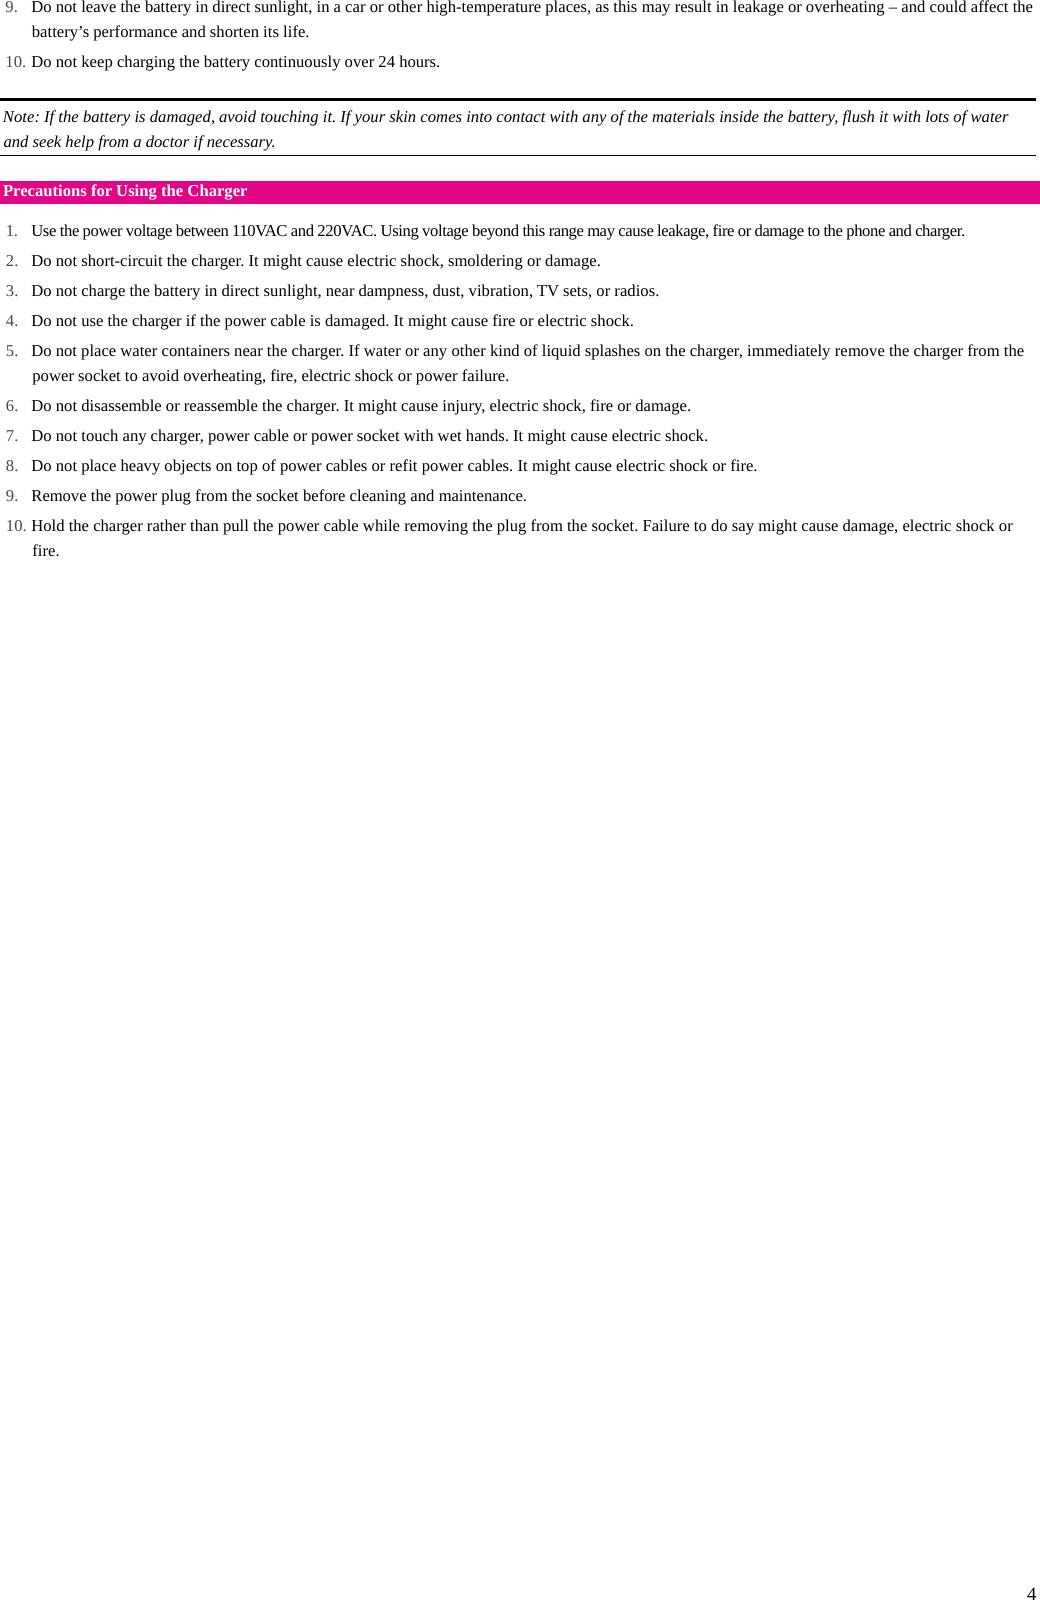 calaske - T mobile manuals picture message settings